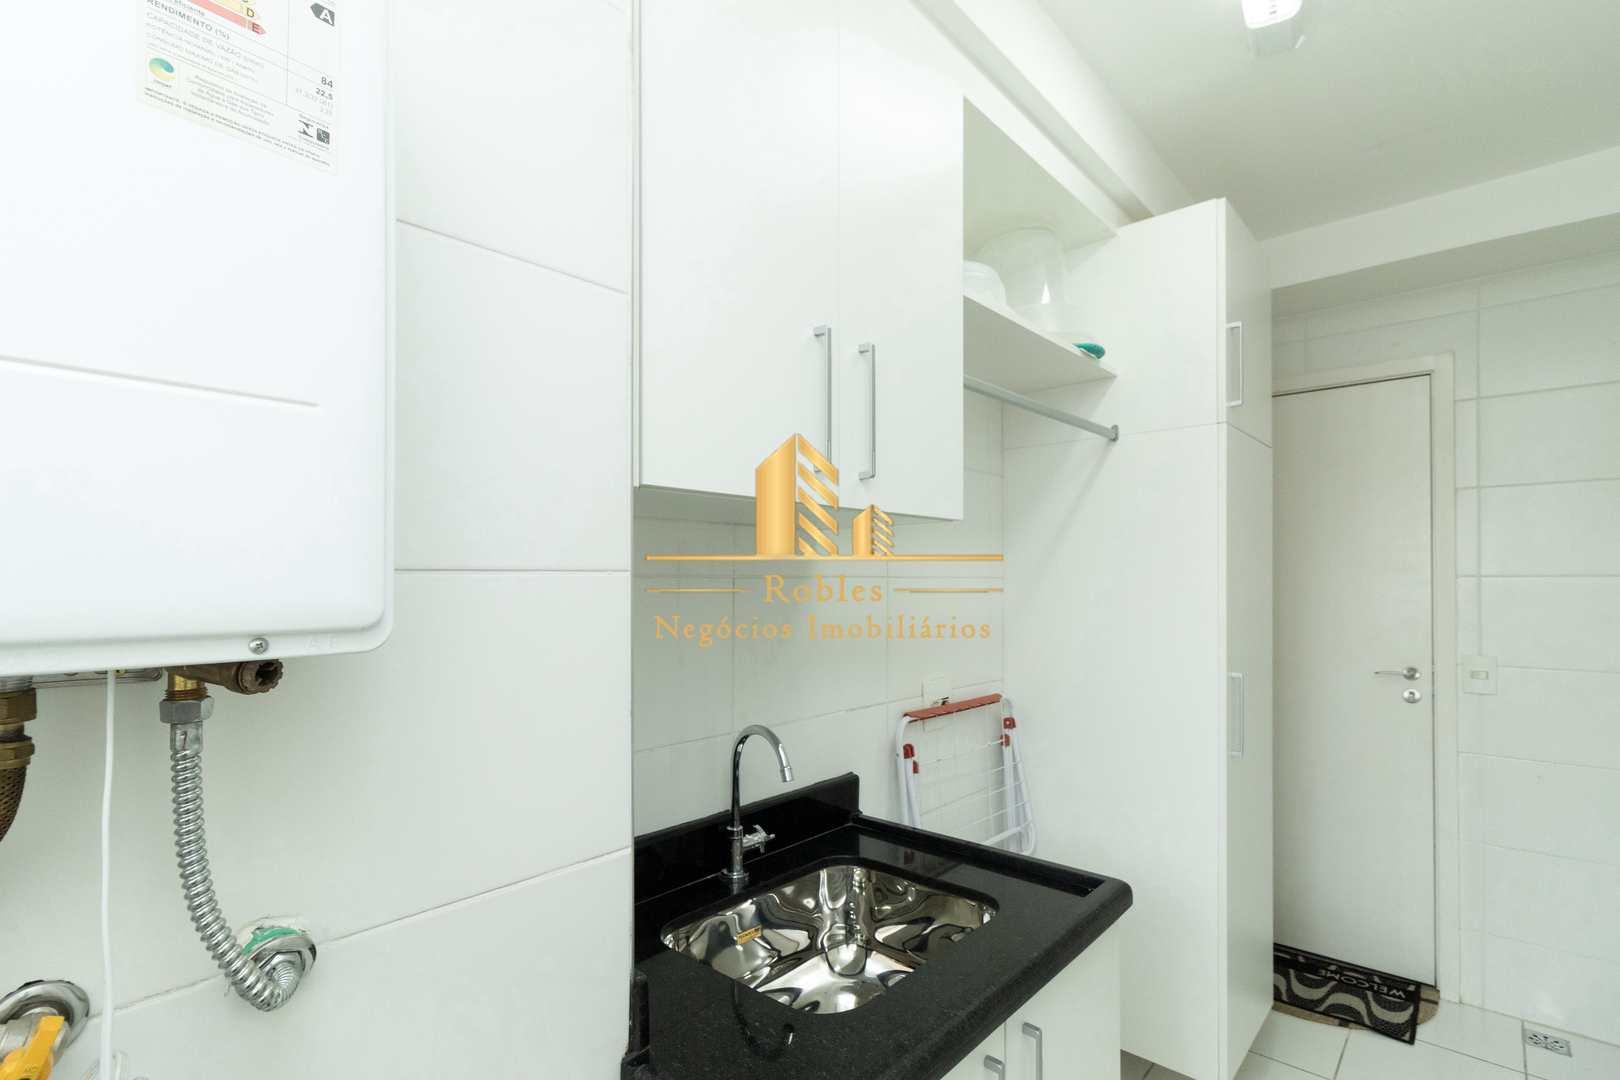 Apartamento com 2 dorms, Granja Julieta, São Paulo - R$ 1.13 mi, Cod: 1579